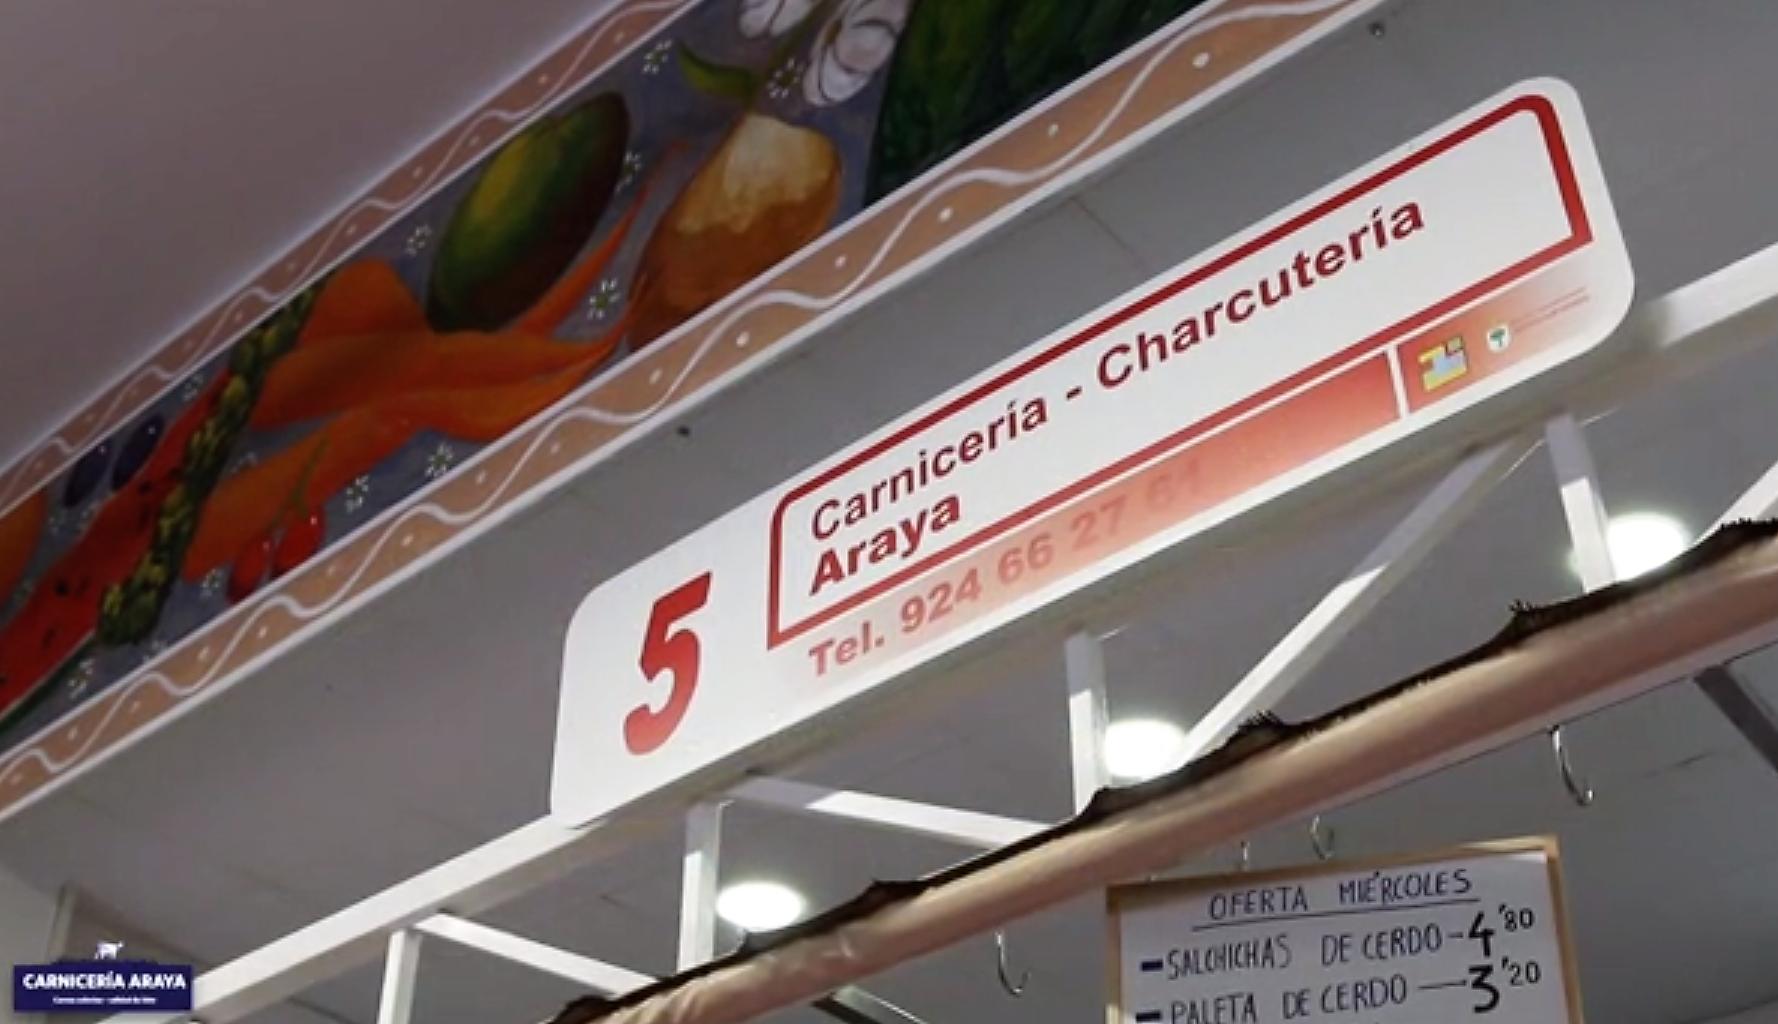 españa carniceria especializada araya